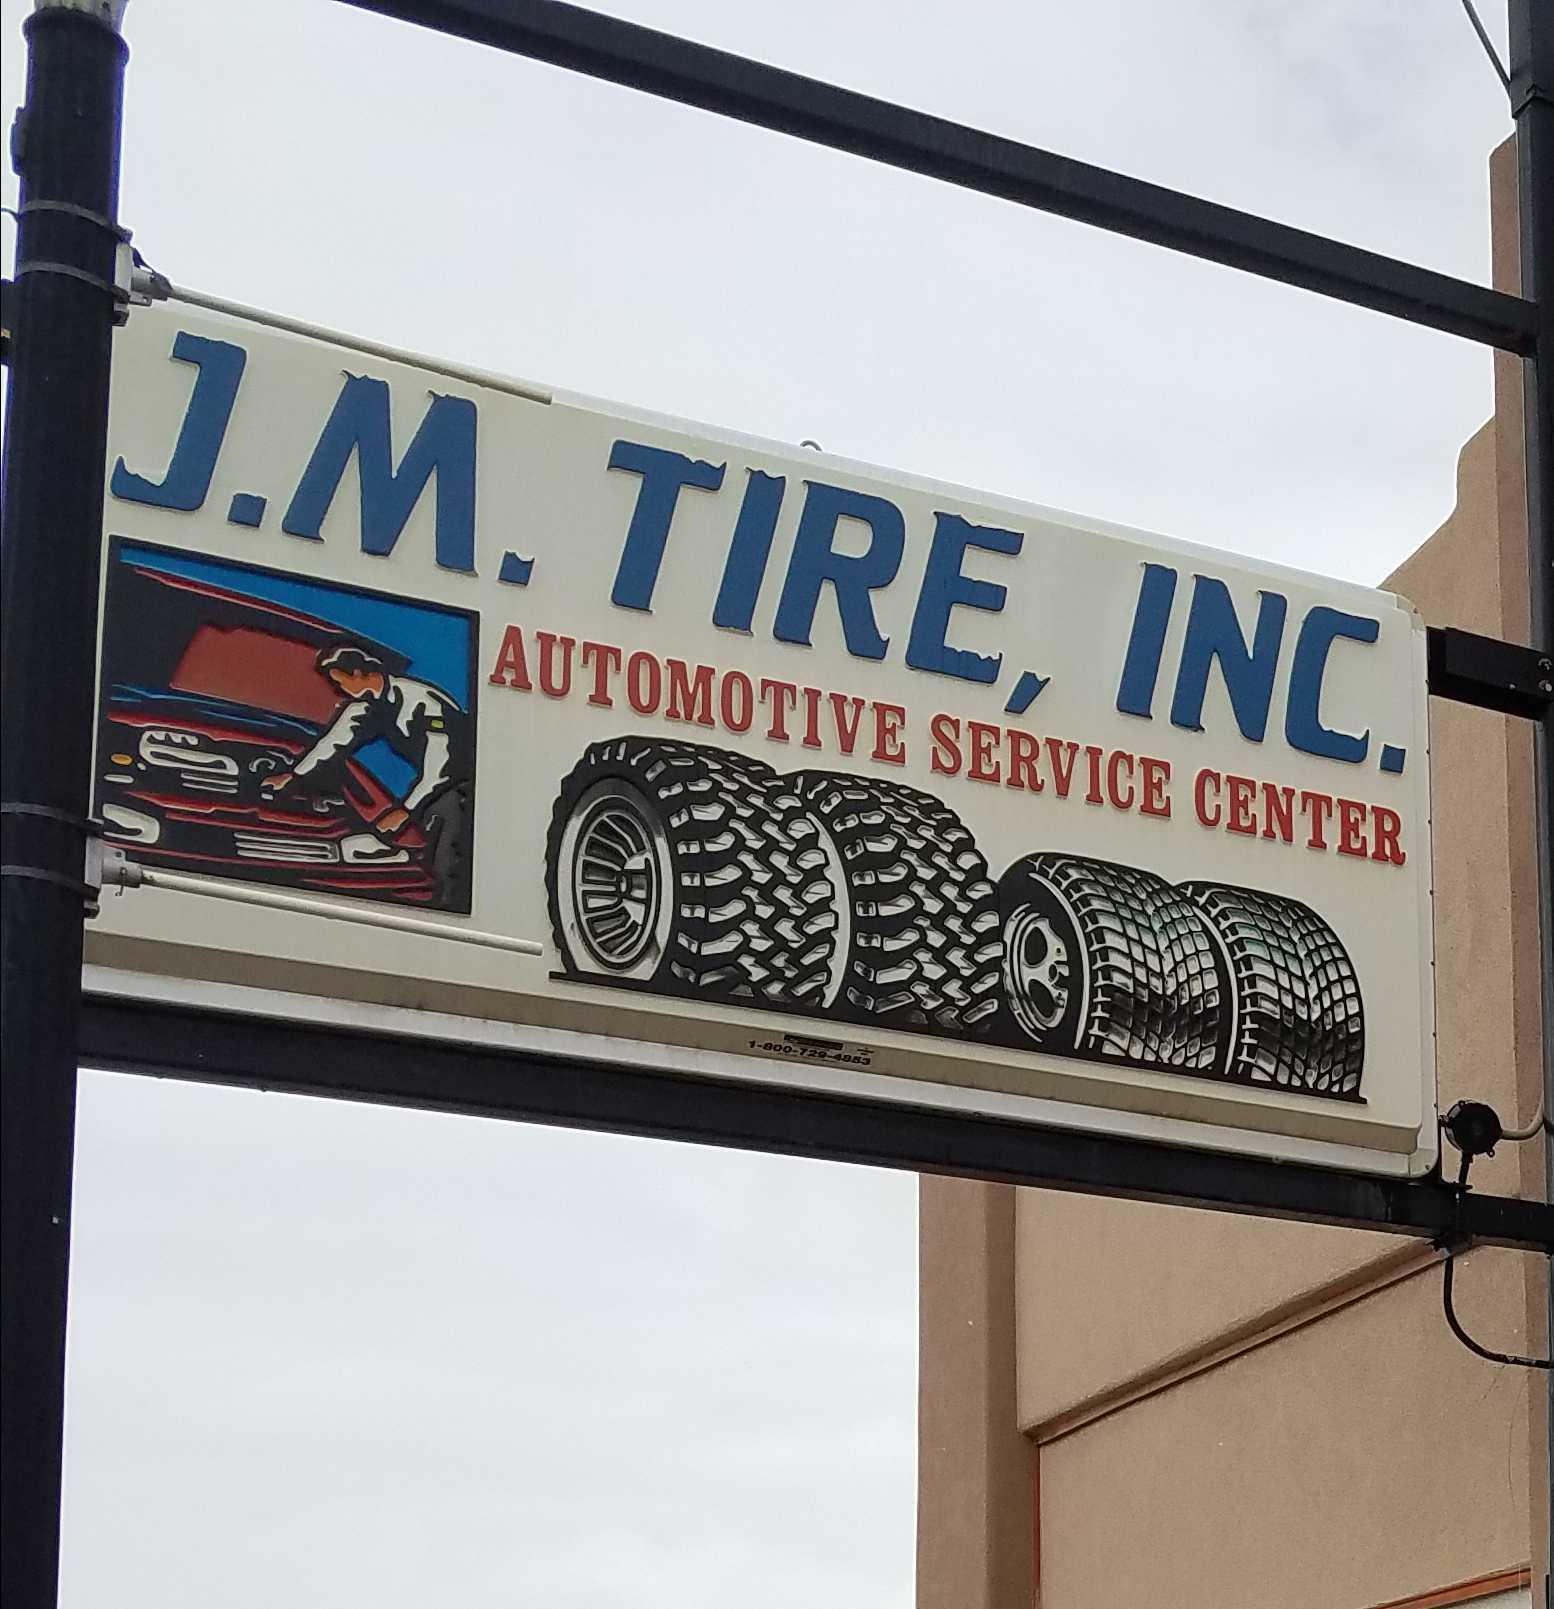 Smart Start Ignition Interlock Shop Location: J.M. Tire Inc. Featured Image